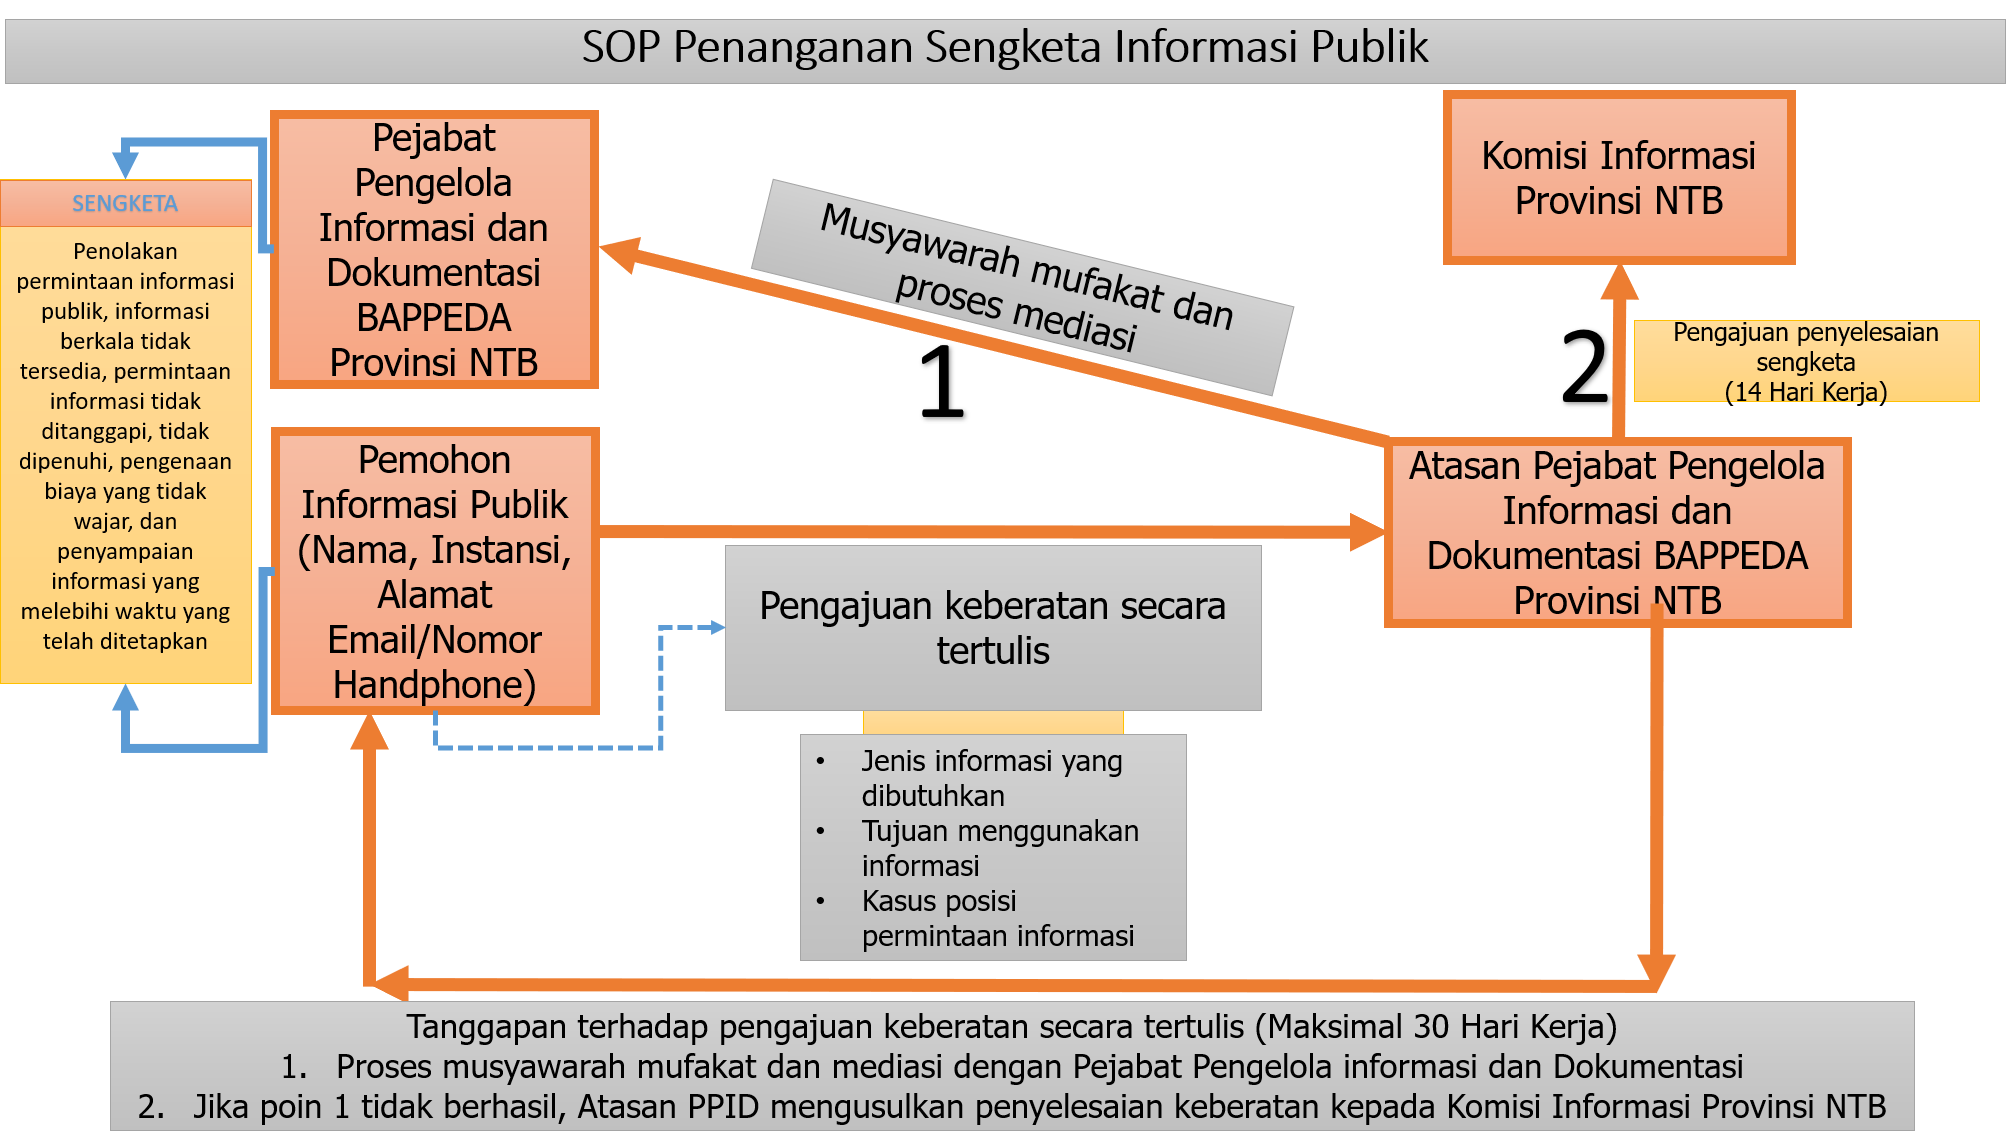 SOP Penanganan Sengketa Informasi Publik